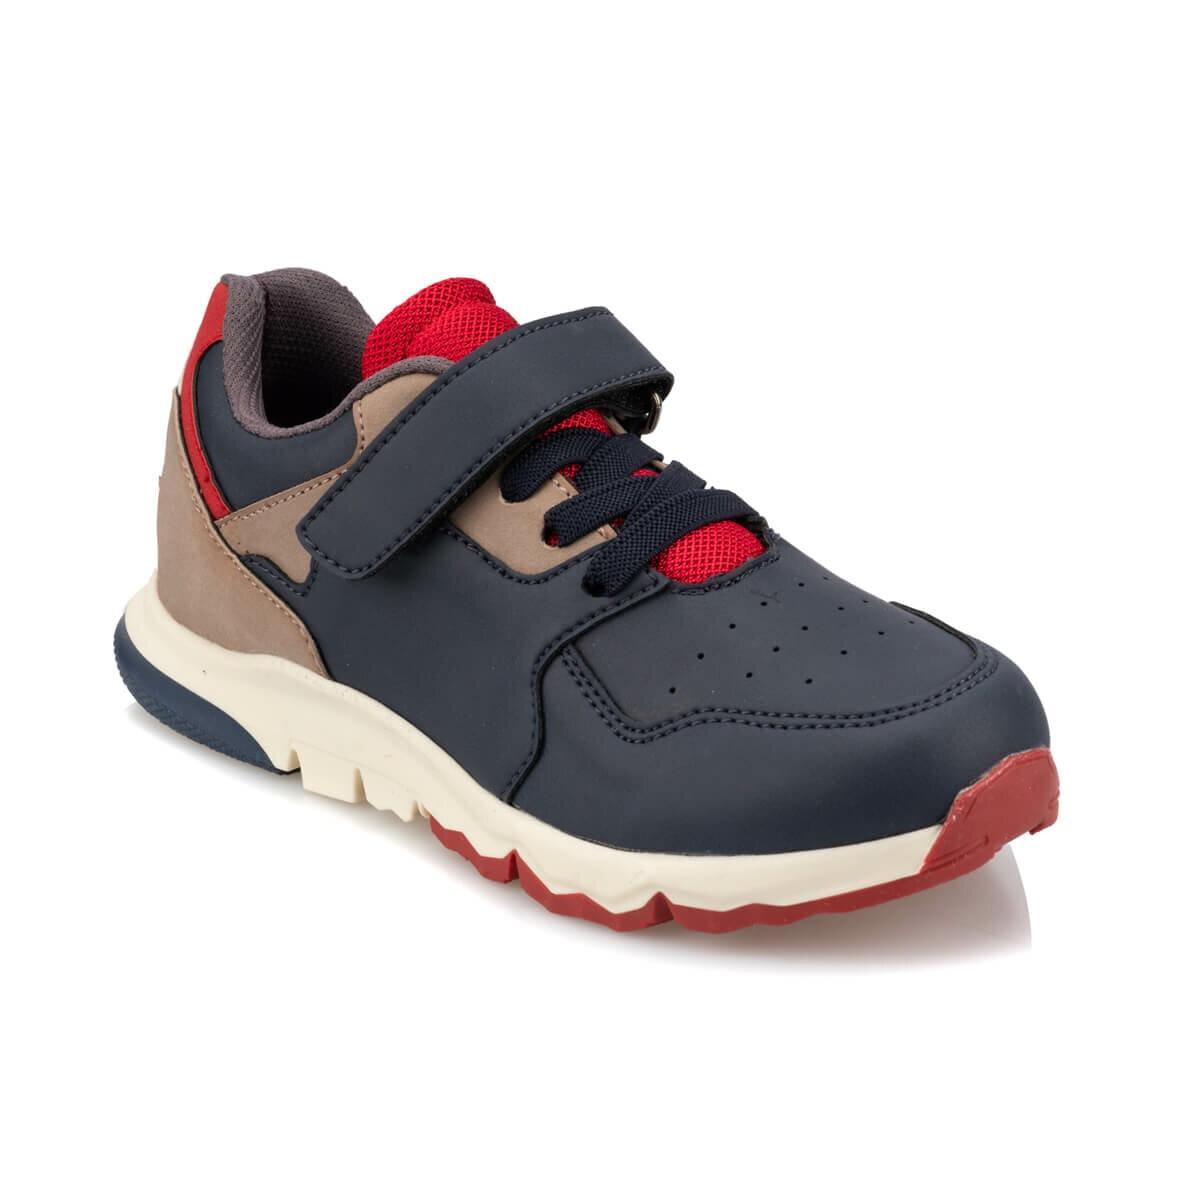 FLO 92.512043.F Navy Blue Male Child Sneaker Shoes Polaris